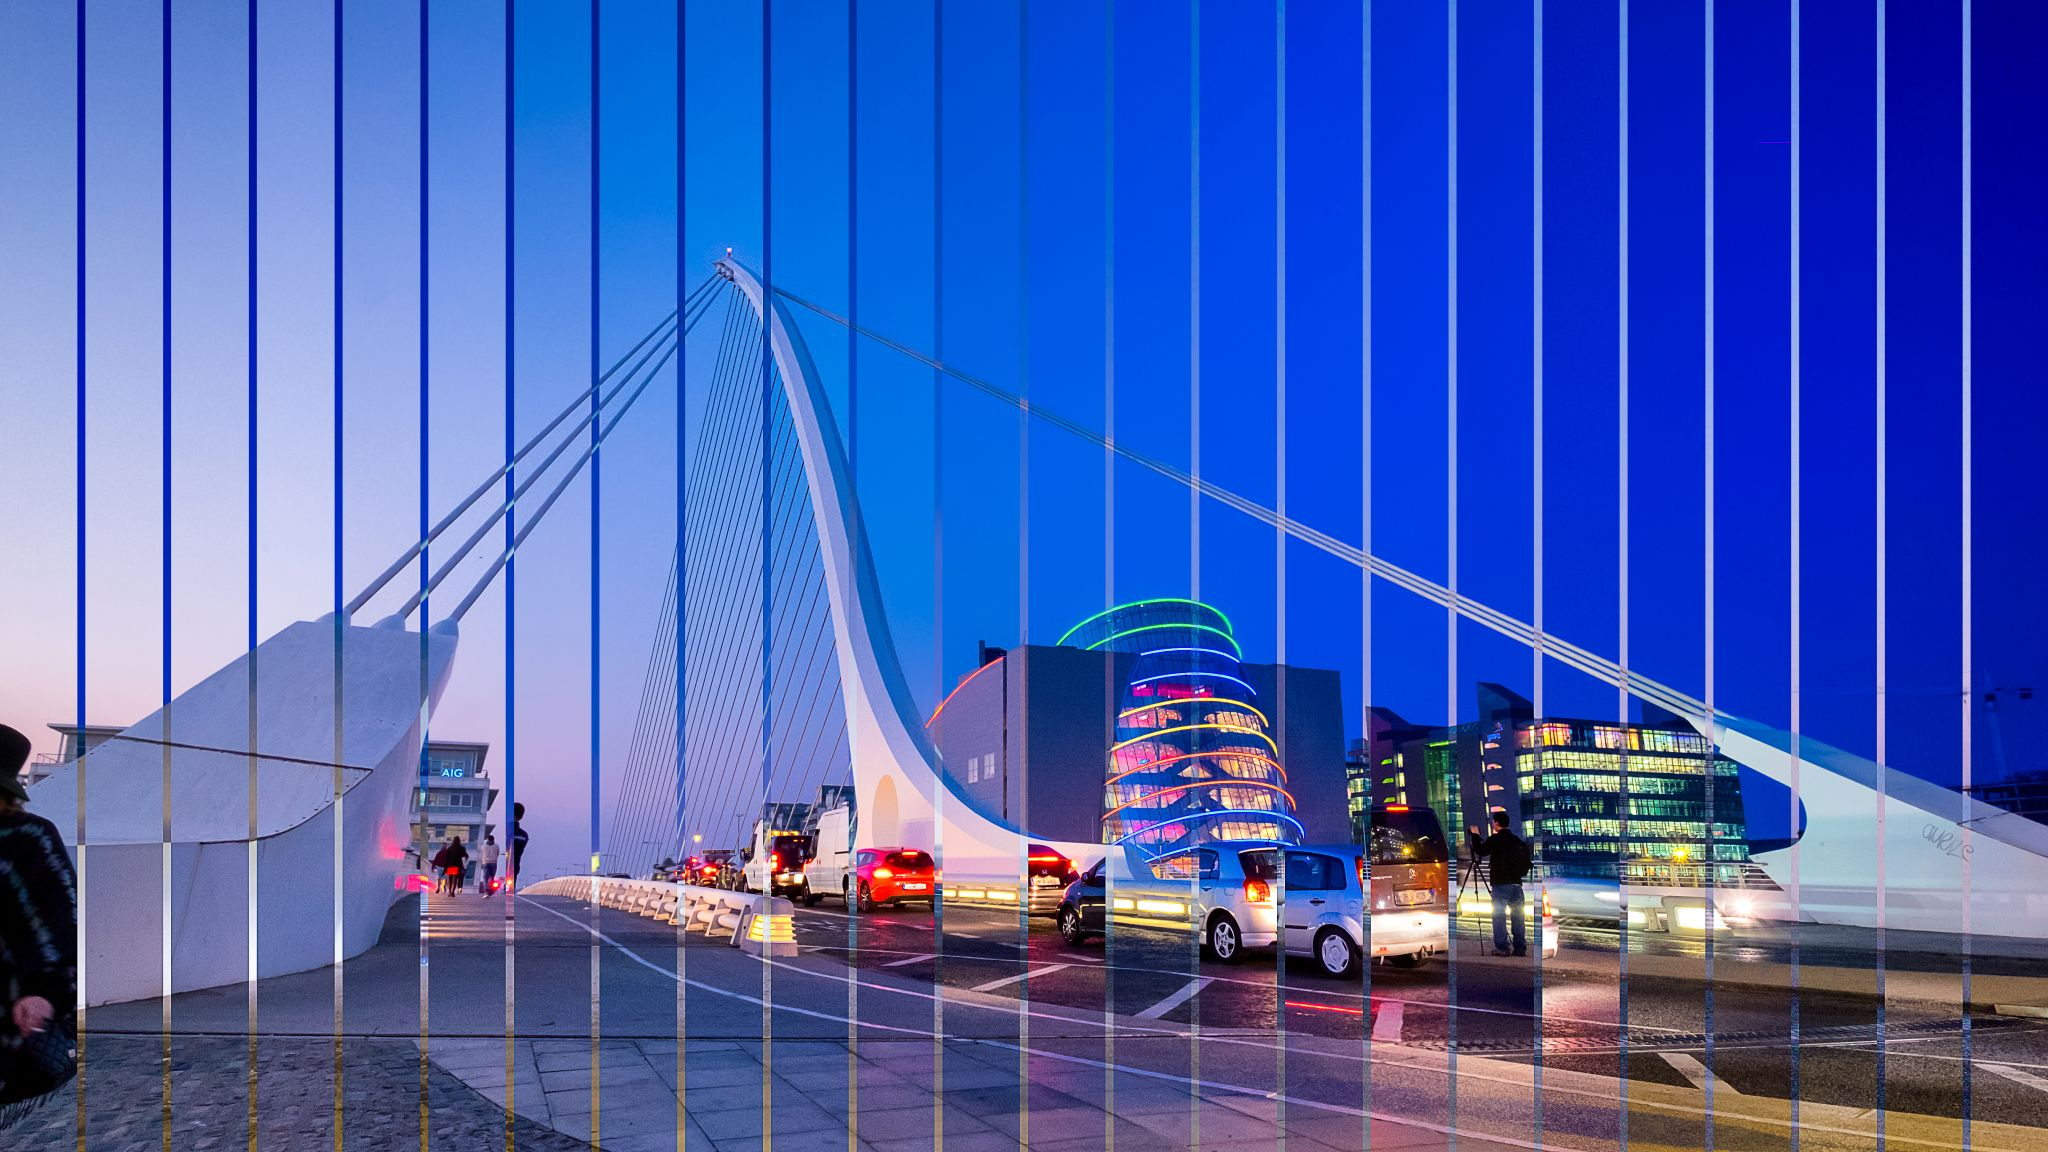 Samuel Beckett Bridge/ National Convention Centre, Ireland